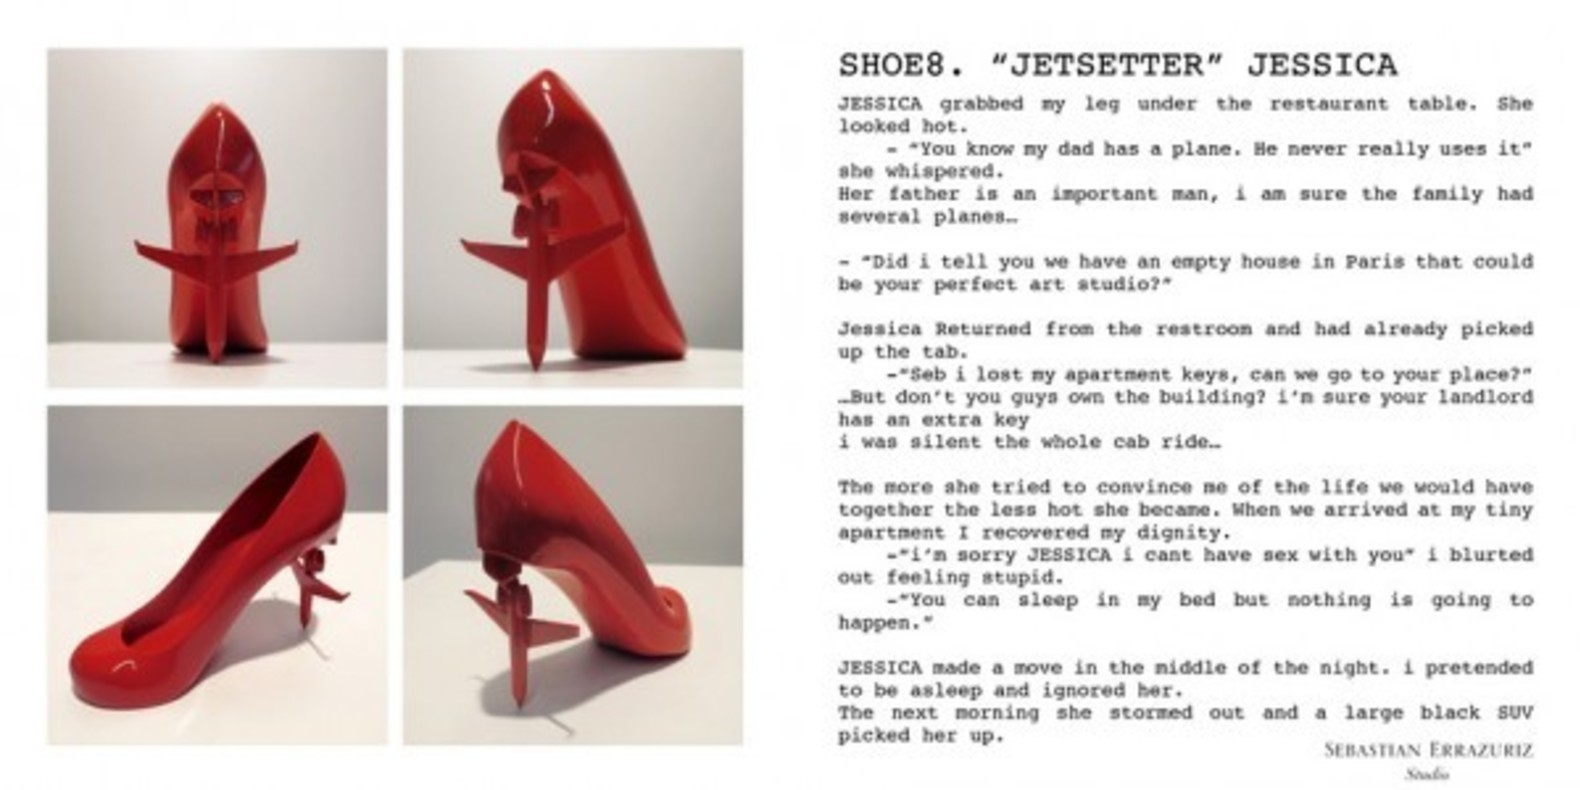 sebastian errazuriz shoe 3D print cults chaussures imprimees en 3D makerbot melissa designer 3D 4